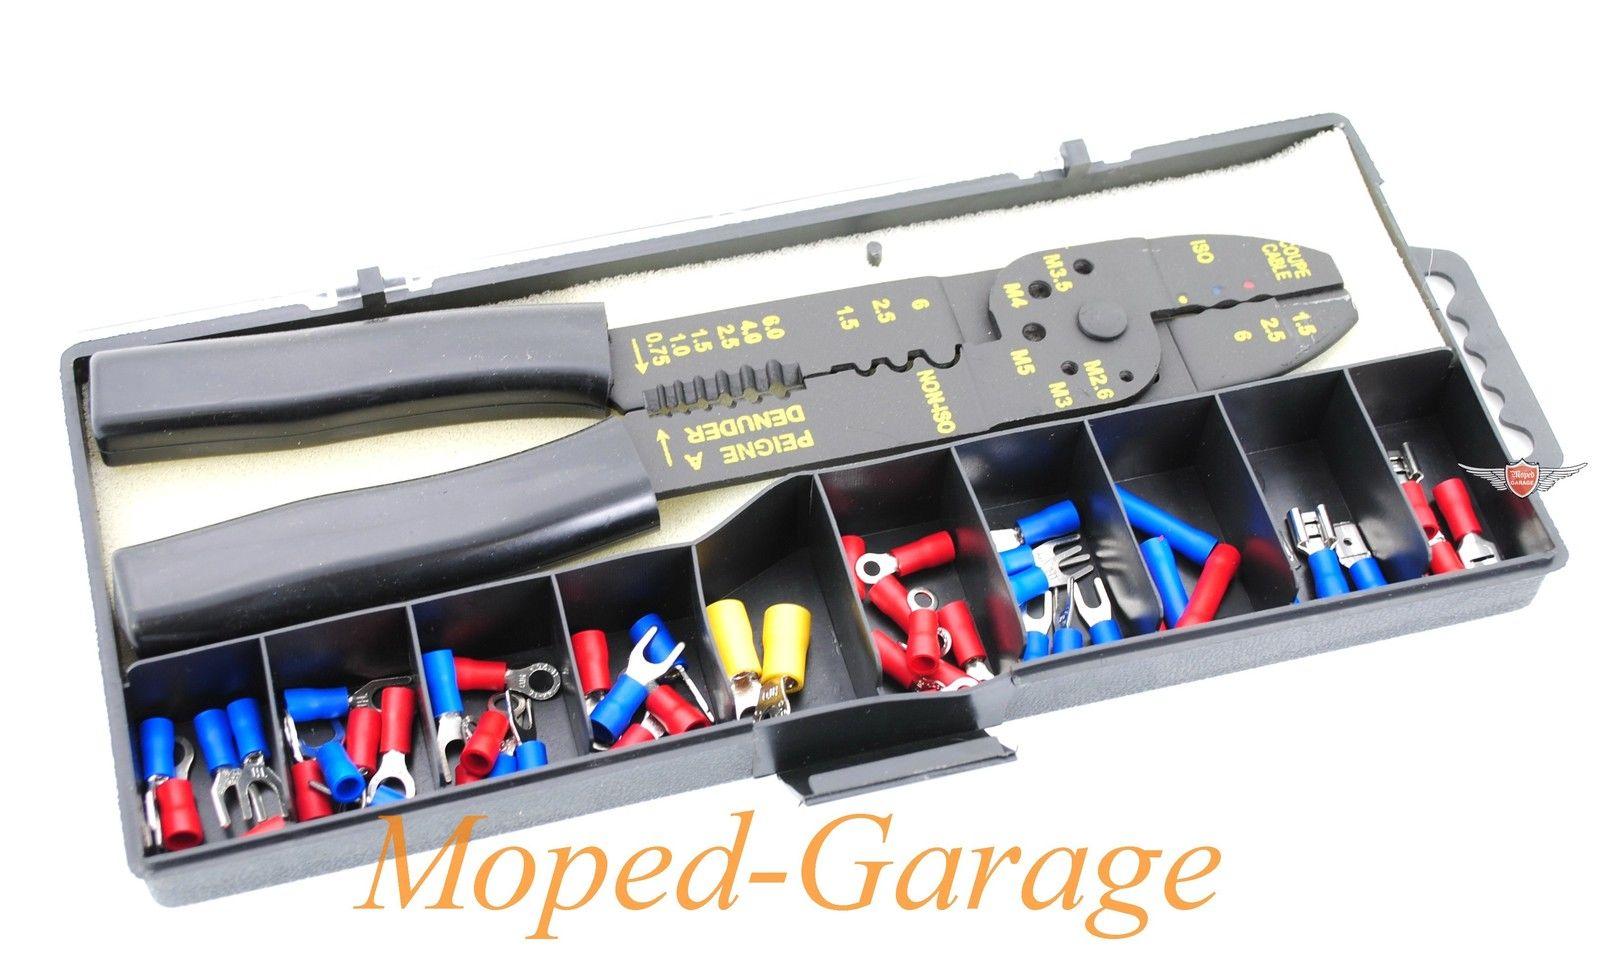 moped mofa moped elektrik anschluss set. Black Bedroom Furniture Sets. Home Design Ideas